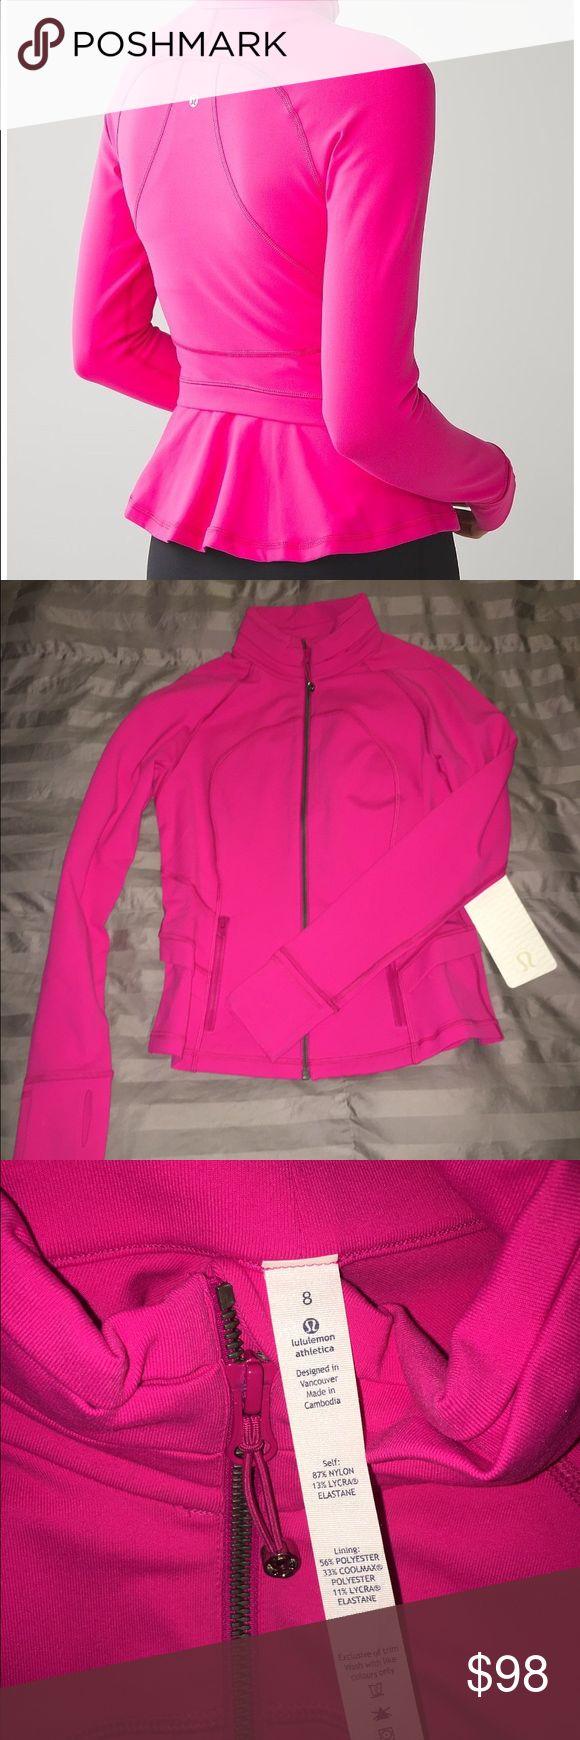 Lululemon Hustle in Your Bustle Jacket NWT 8 Beautiful pink peplum zip up jacket. Cuter than the define IMO. Cheaper on Ⓜ️ :) lululemon athletica Jackets & Coats